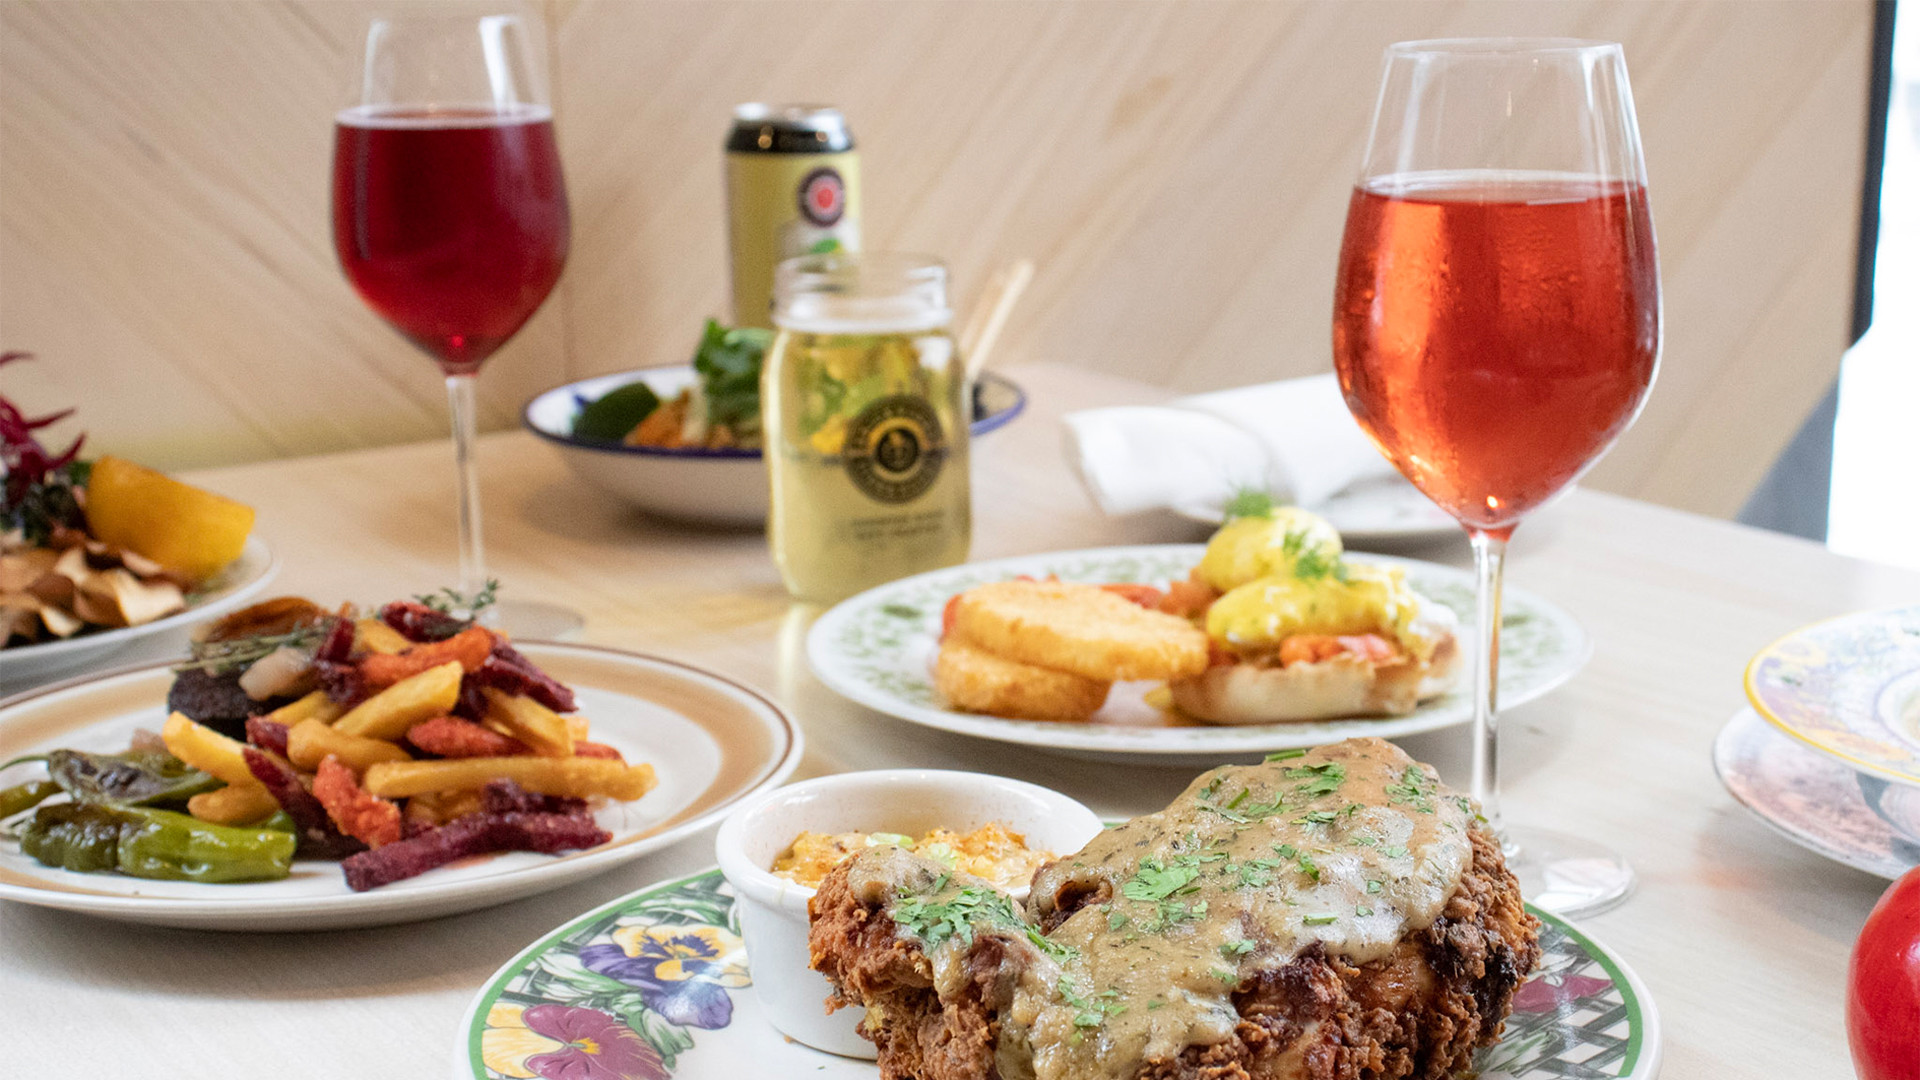 Brickworks Ciderhouse Toronto craft cider | Cider and food pairings